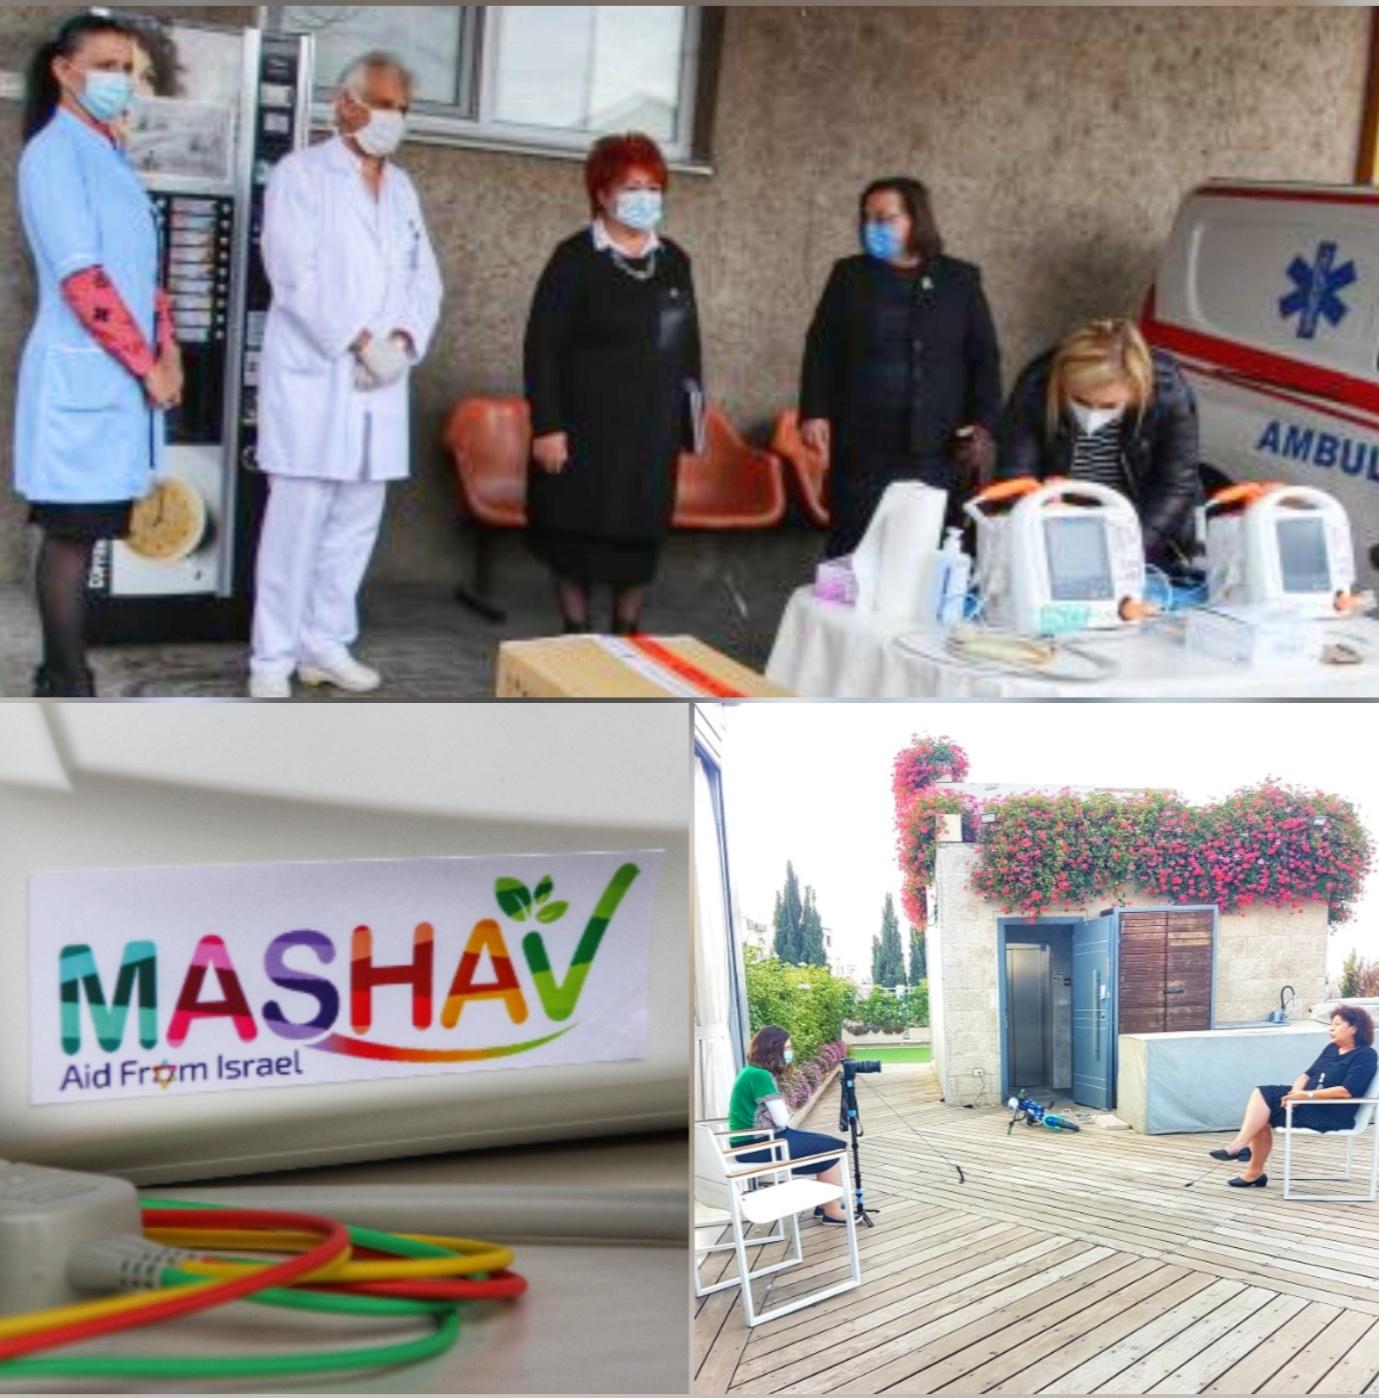 Битолскиот Дом за народно здравје Др. Хаим Абраванел доби два дефибрилатори подарок од Израел